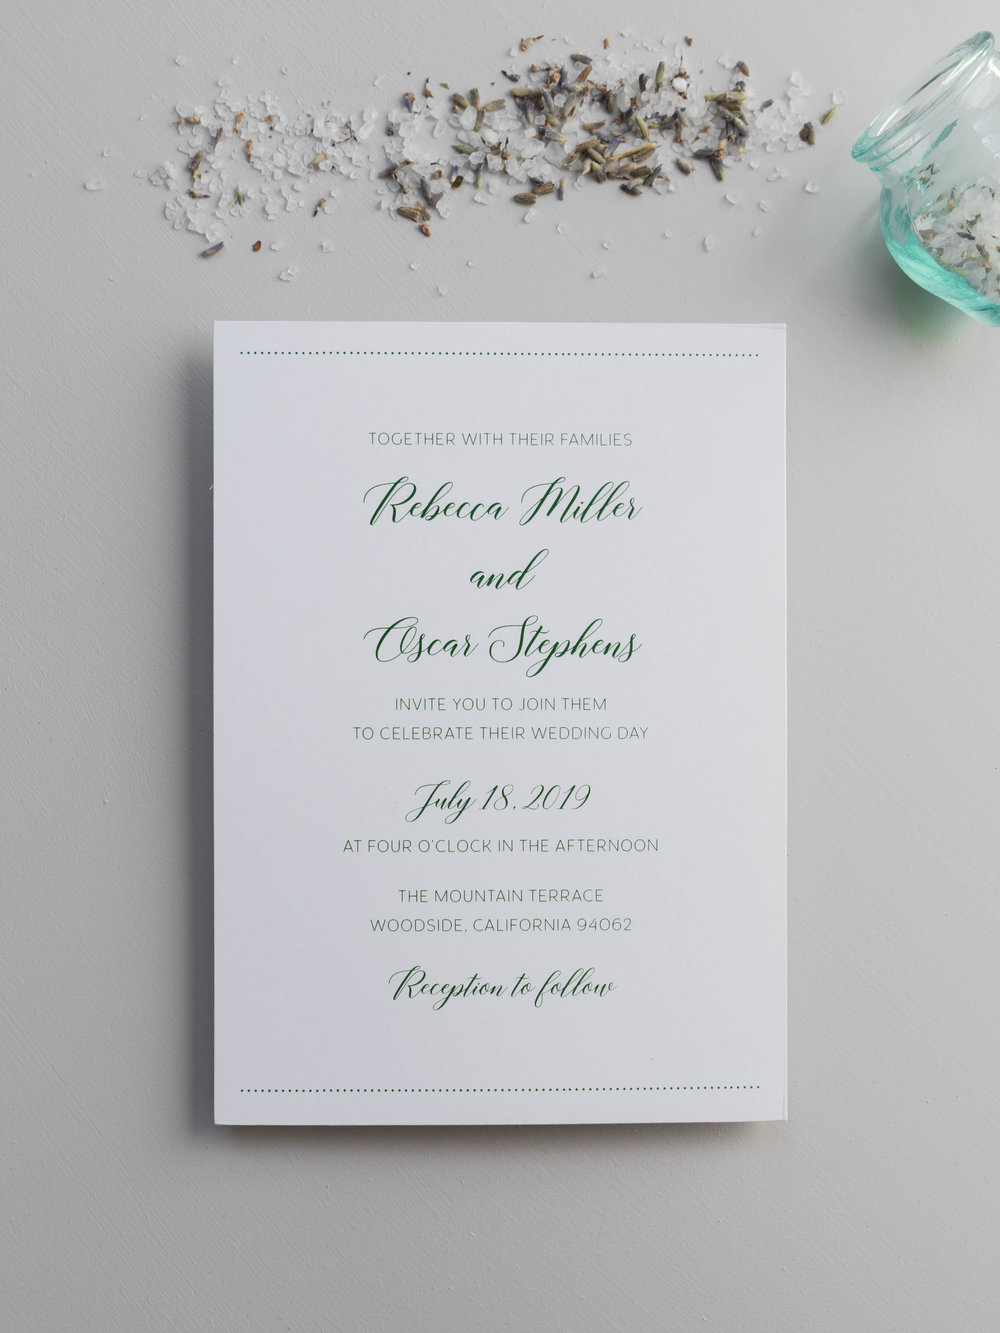 Simple Green Wedding Invitation by Just Jurf-01347.jpg